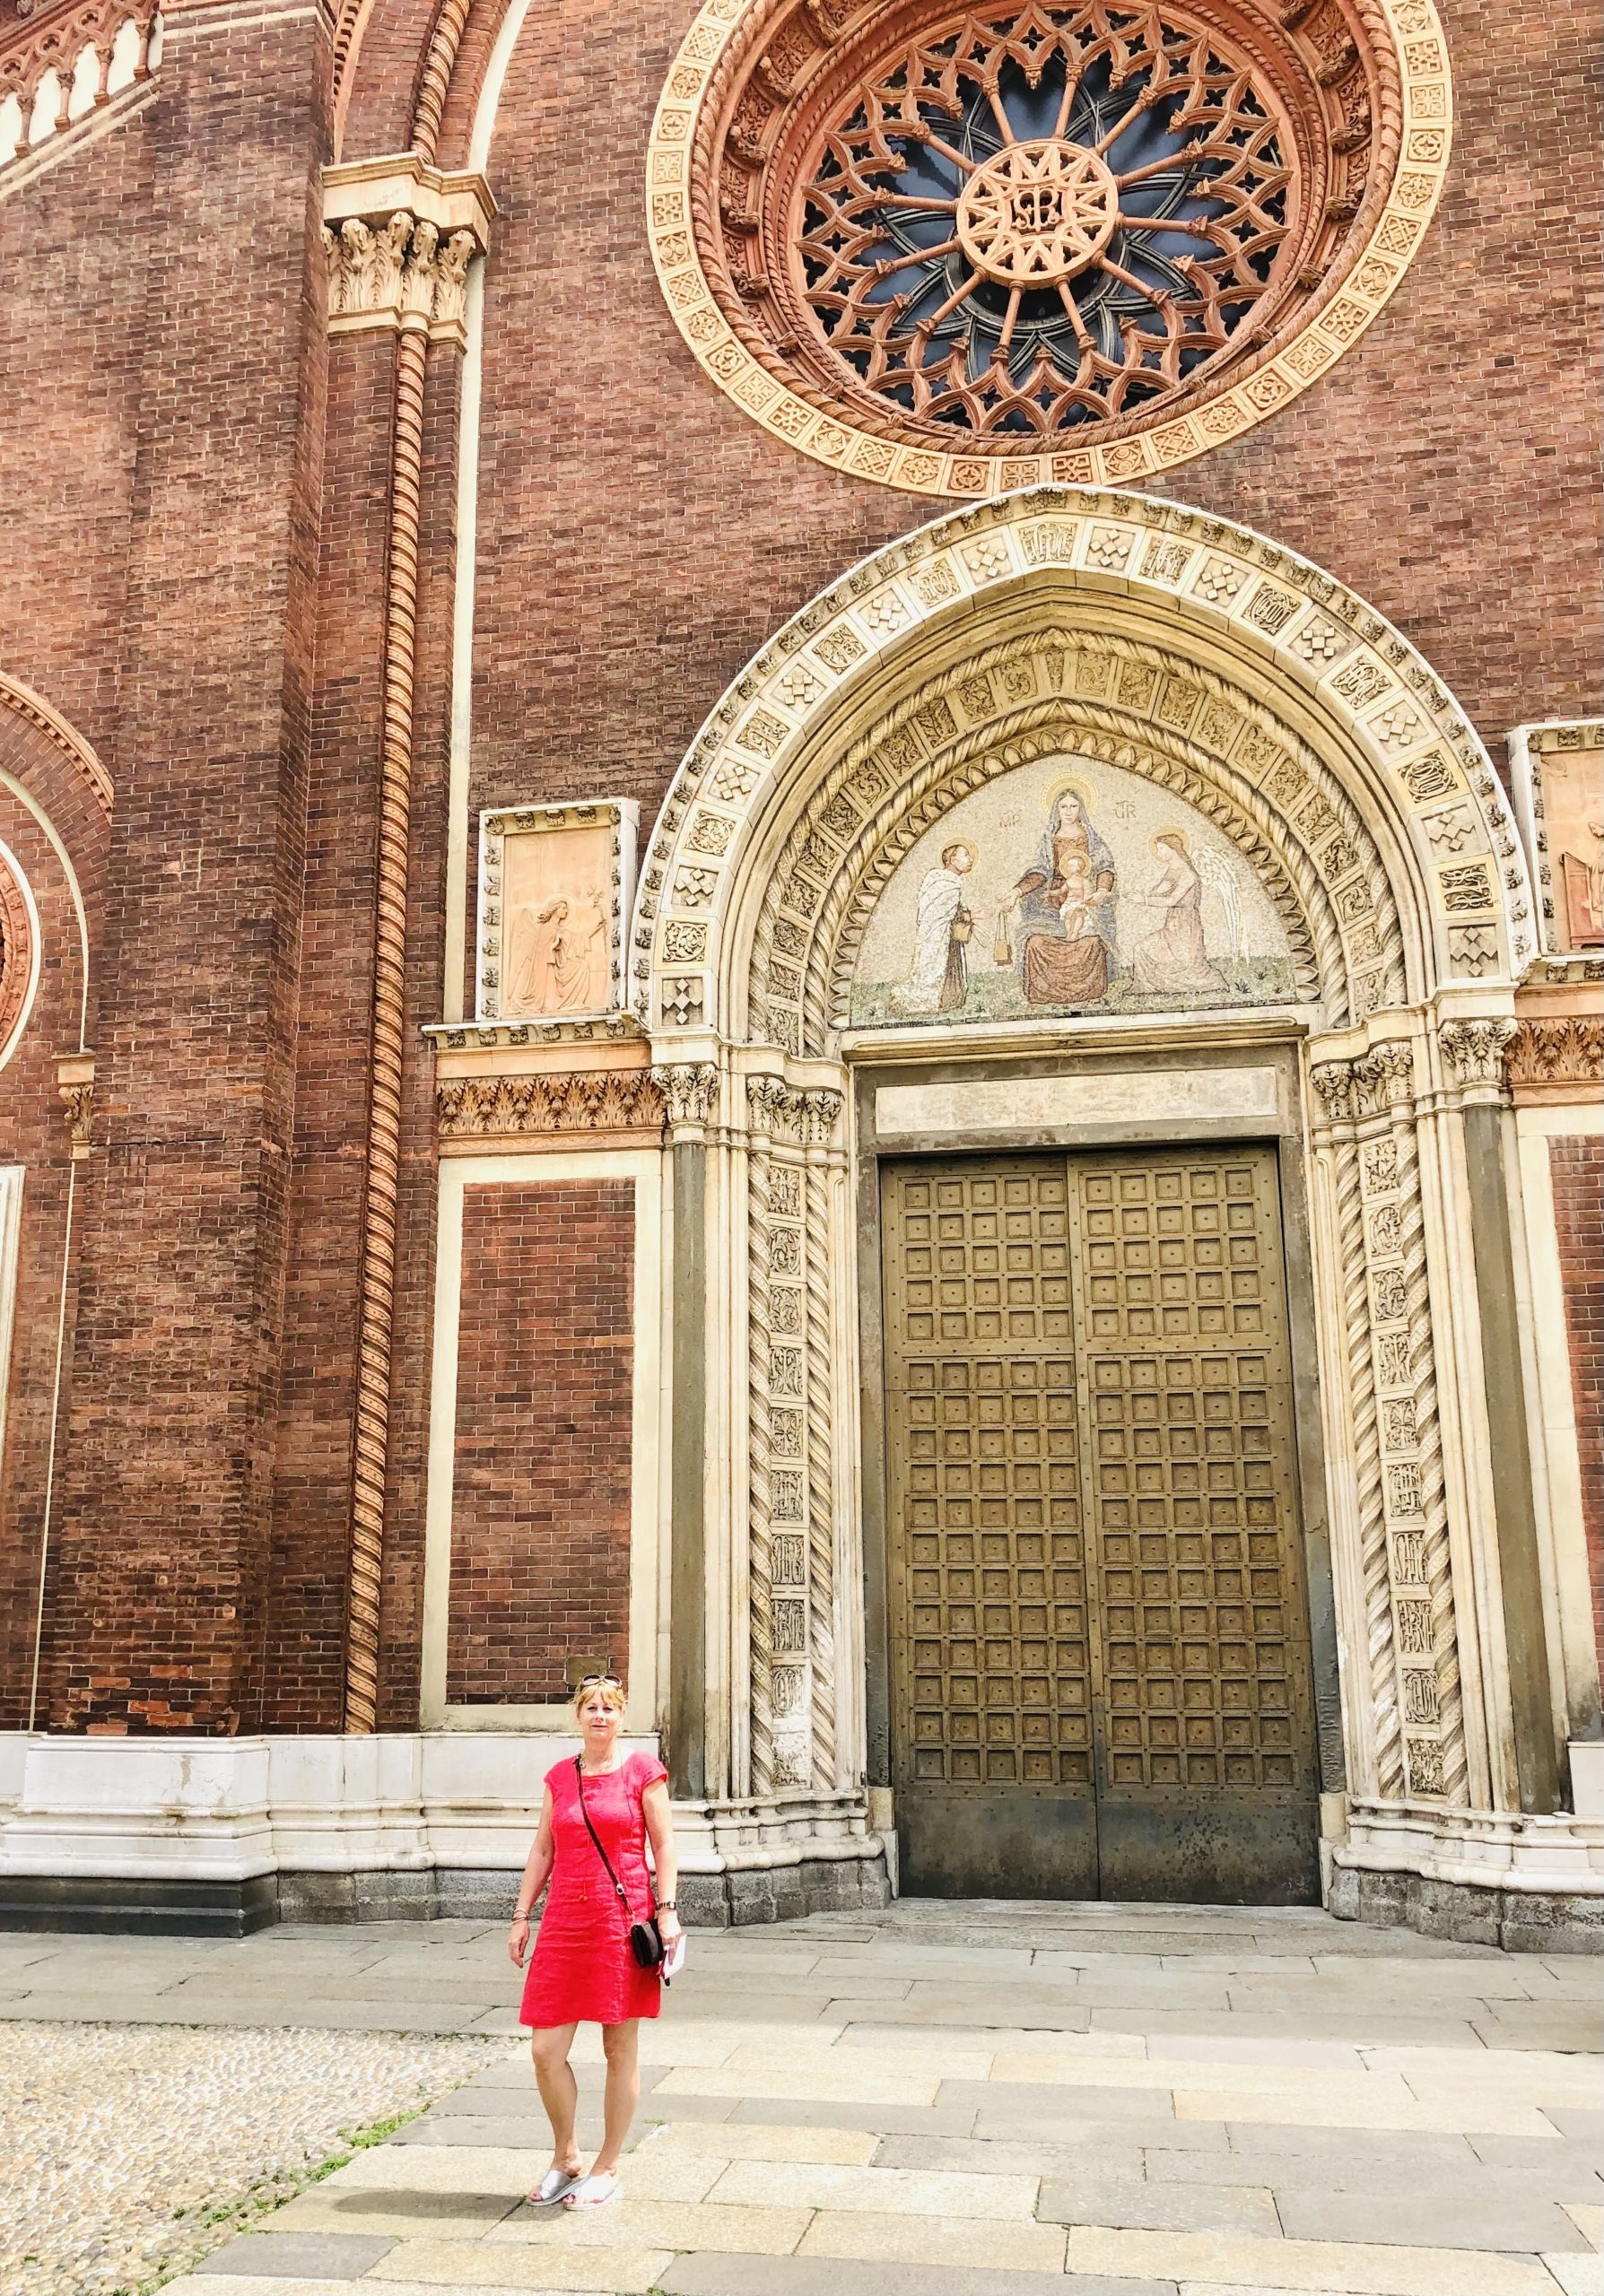 Mailand – Dom und Leonardo